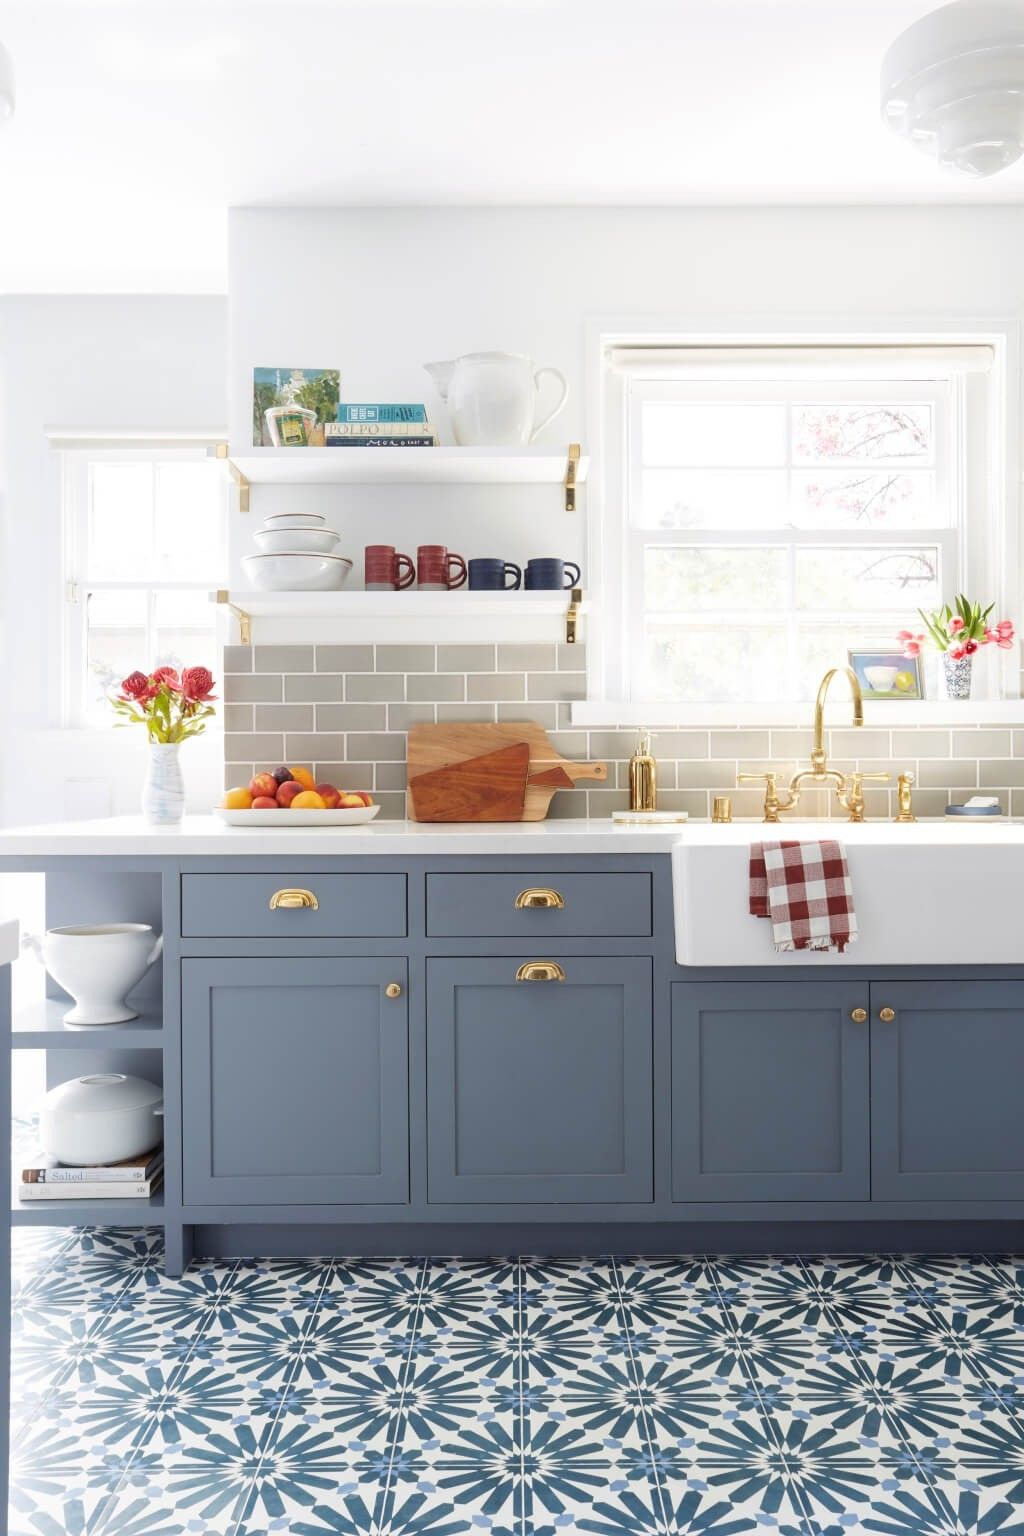 Wolf Gray By Benjamin Moore Kitchen Design Kitchen Cabinets Decor Farmhouse Kitchen Cabinets